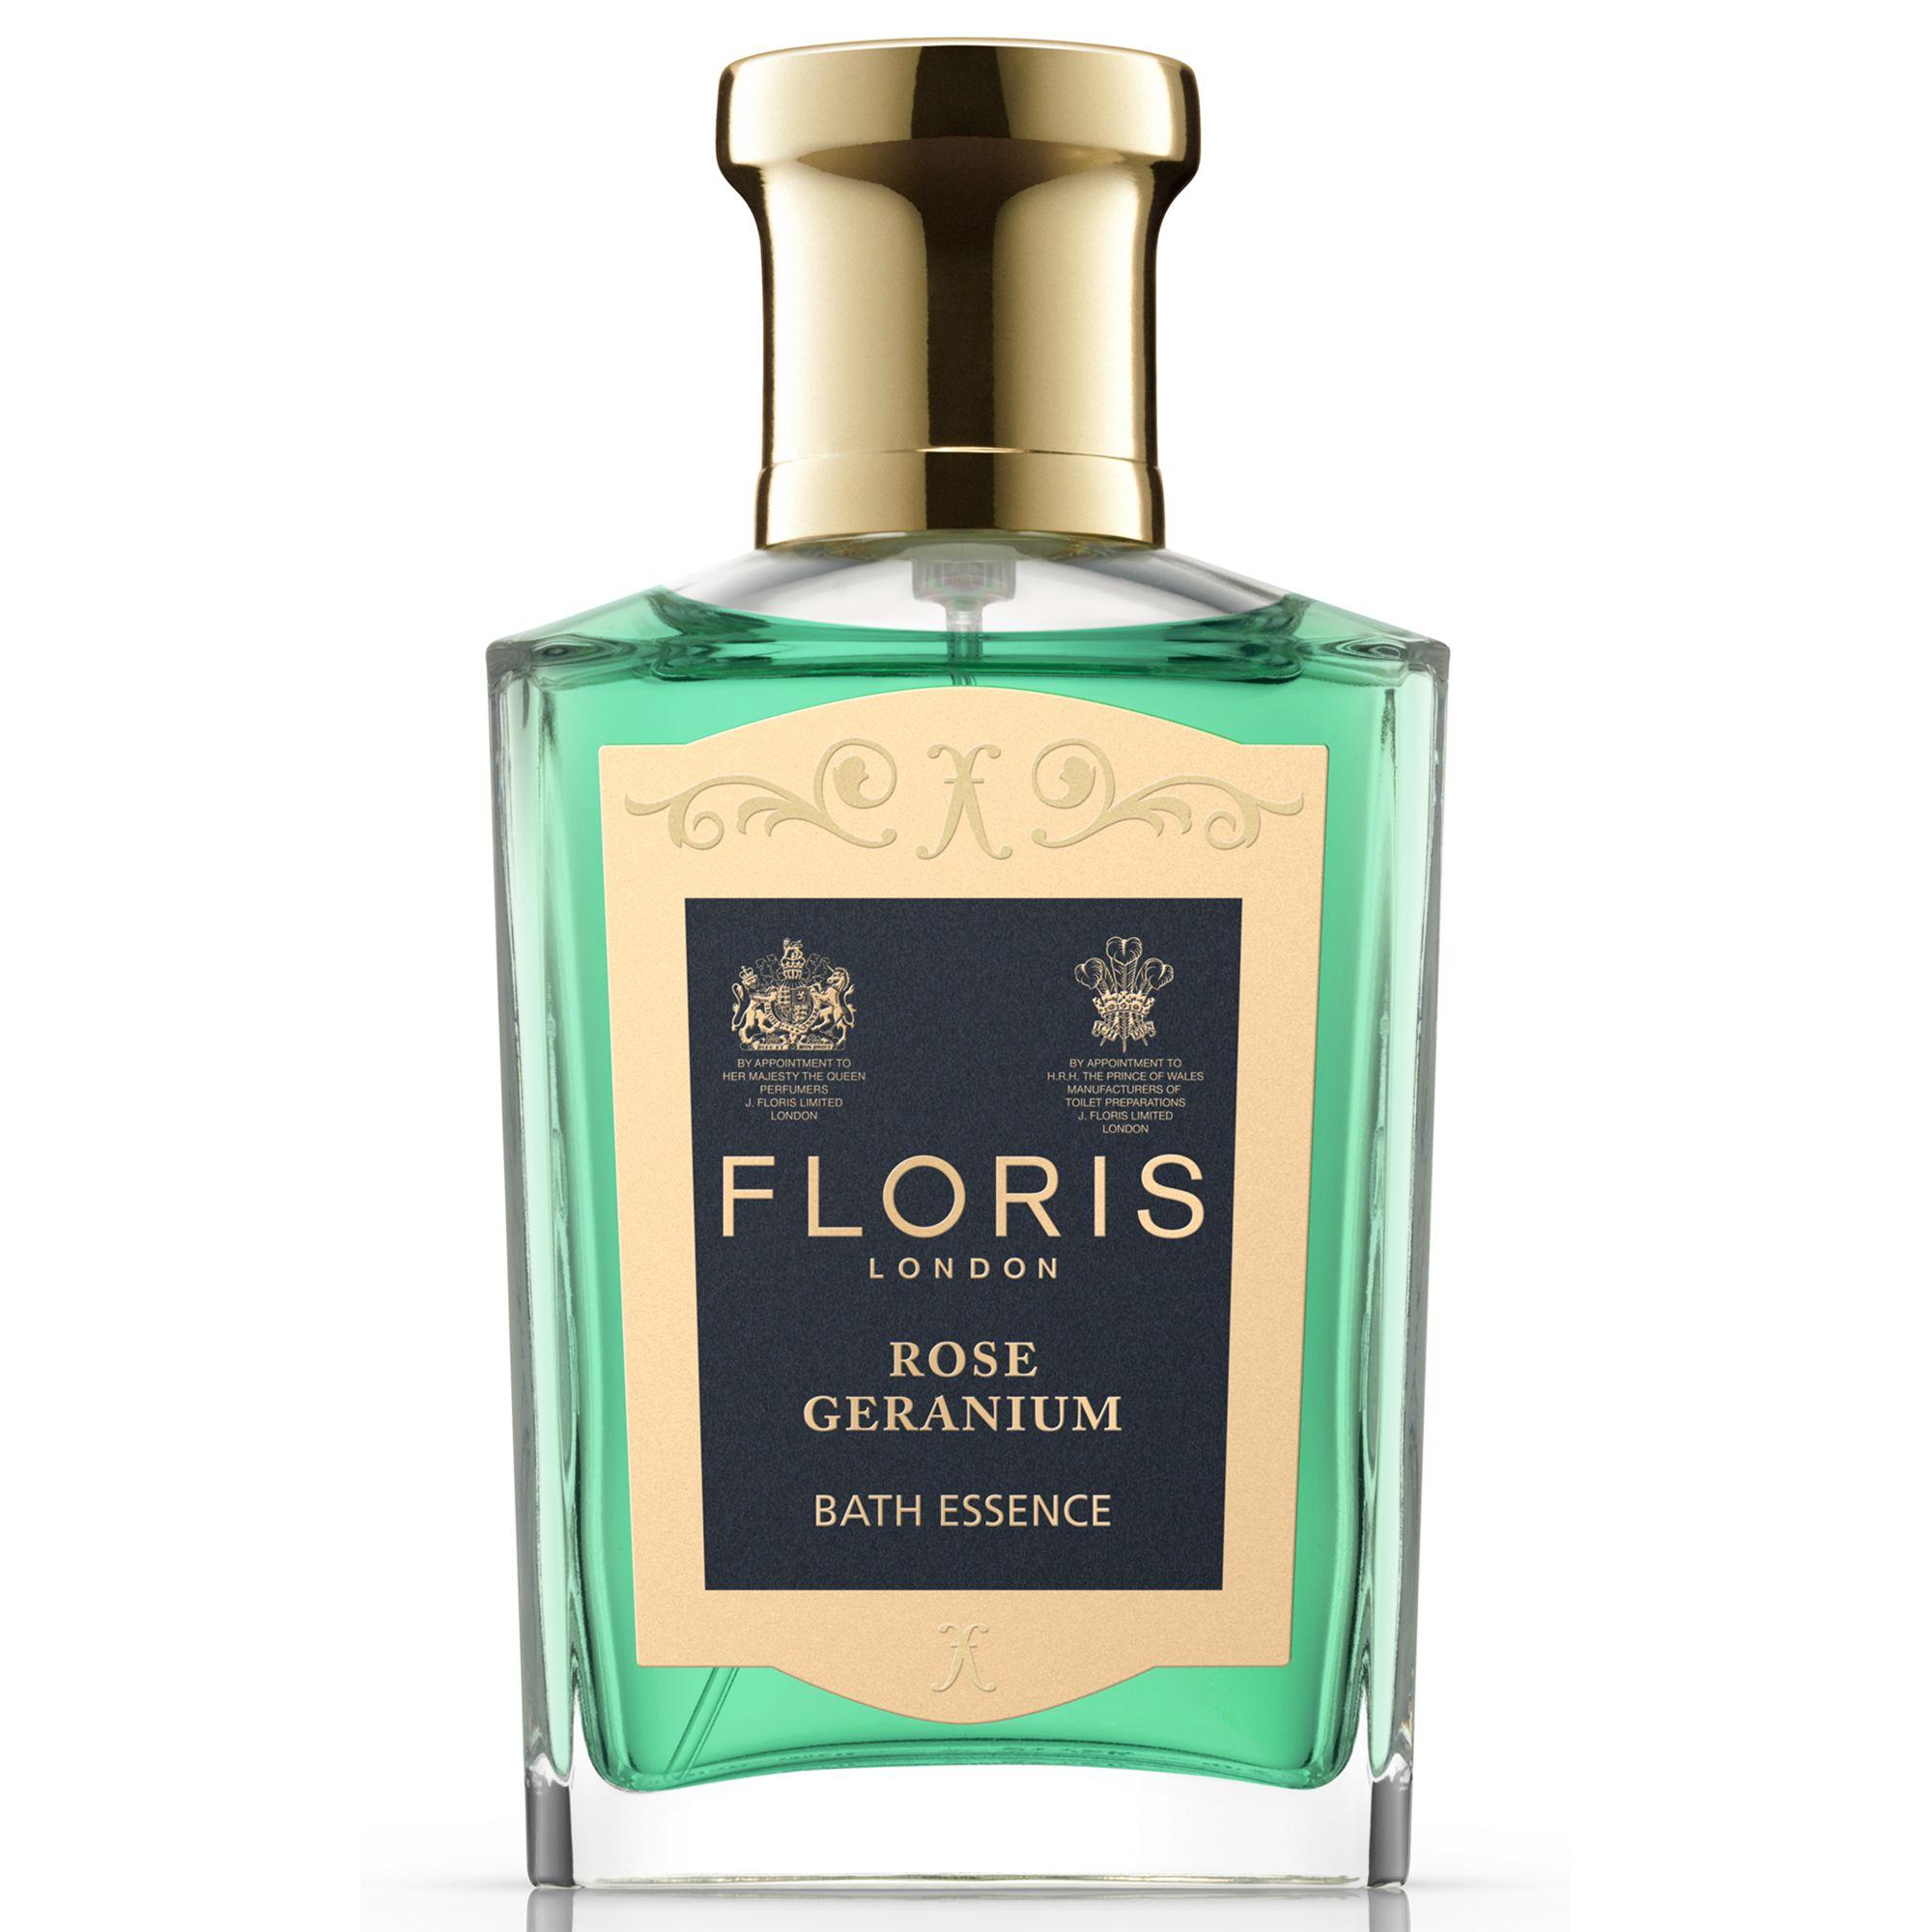 Floris Floris Rose Geranium Bath Essence, 50ml